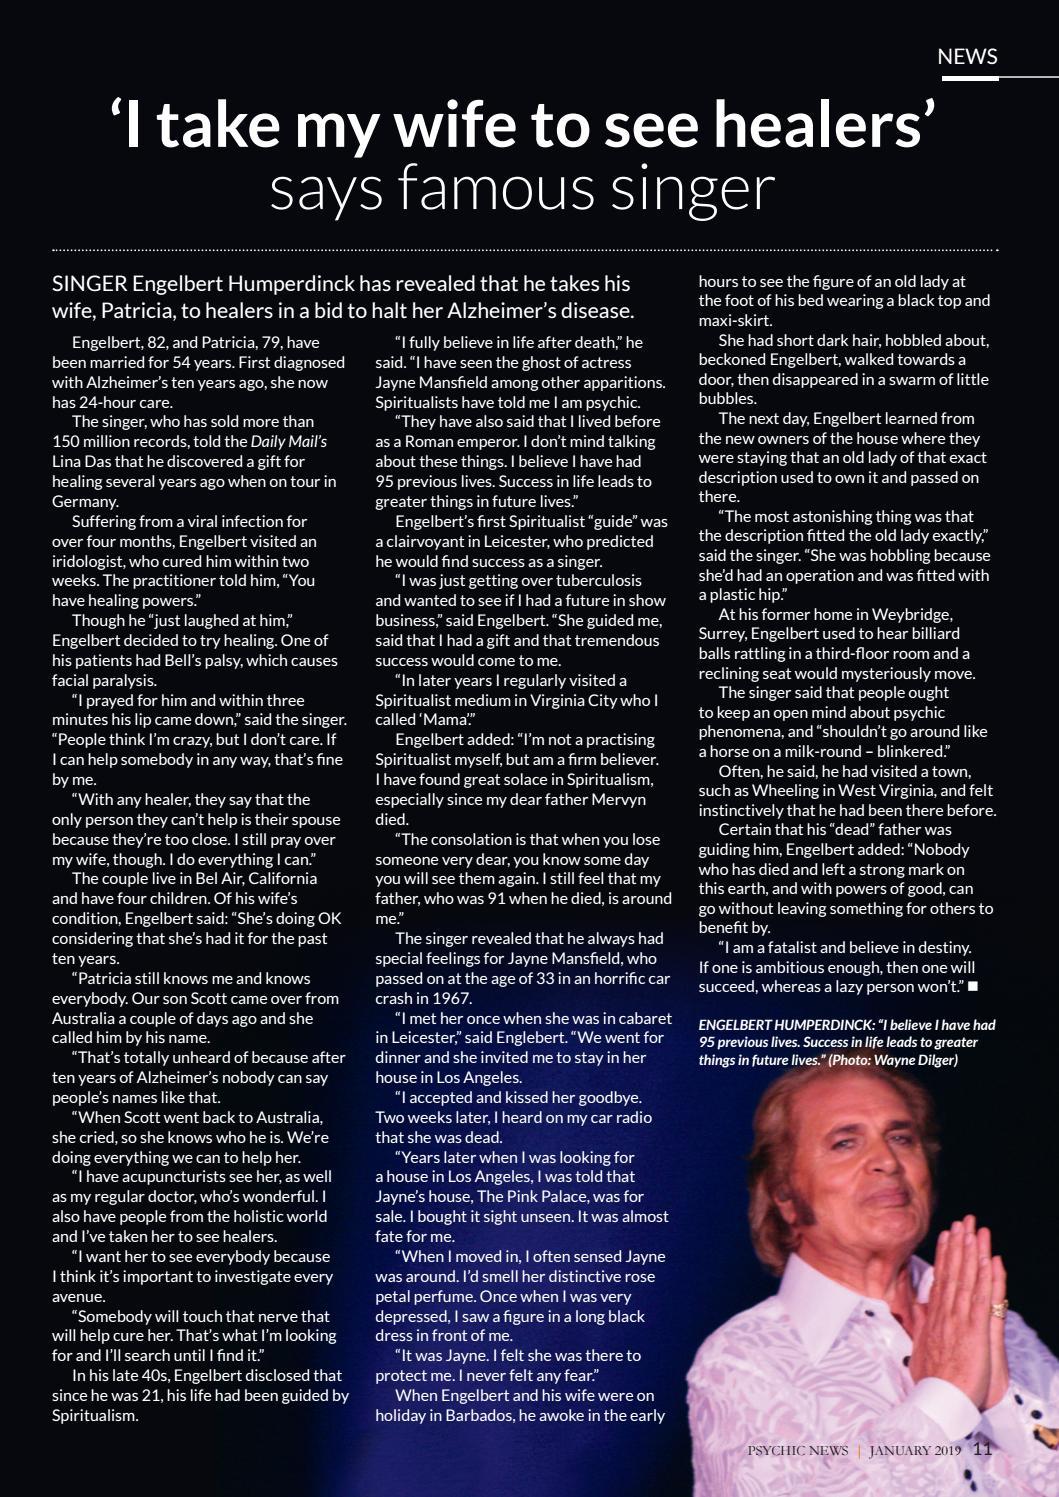 Psychic News January 2019 free story-Engelbert Humperdinck